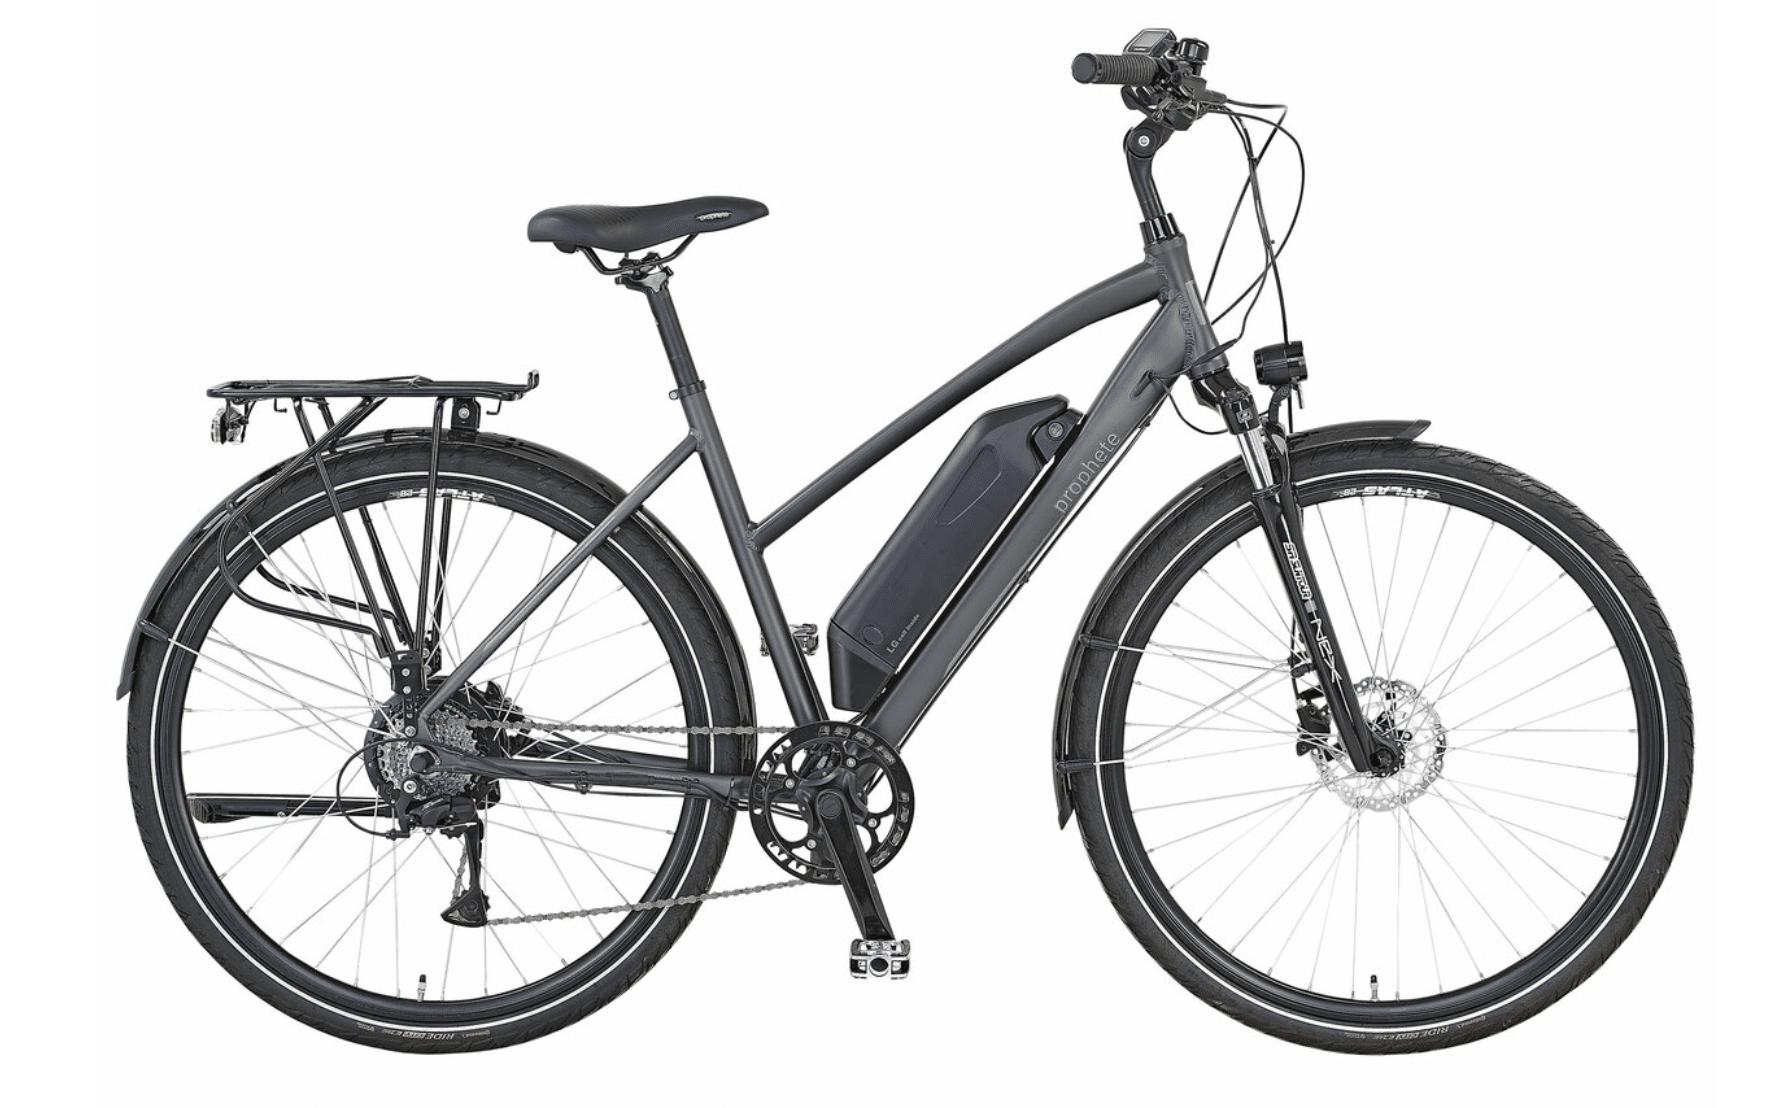 Aldi E-Bike von Prophete mit Trapezrahmen - eBikeNews